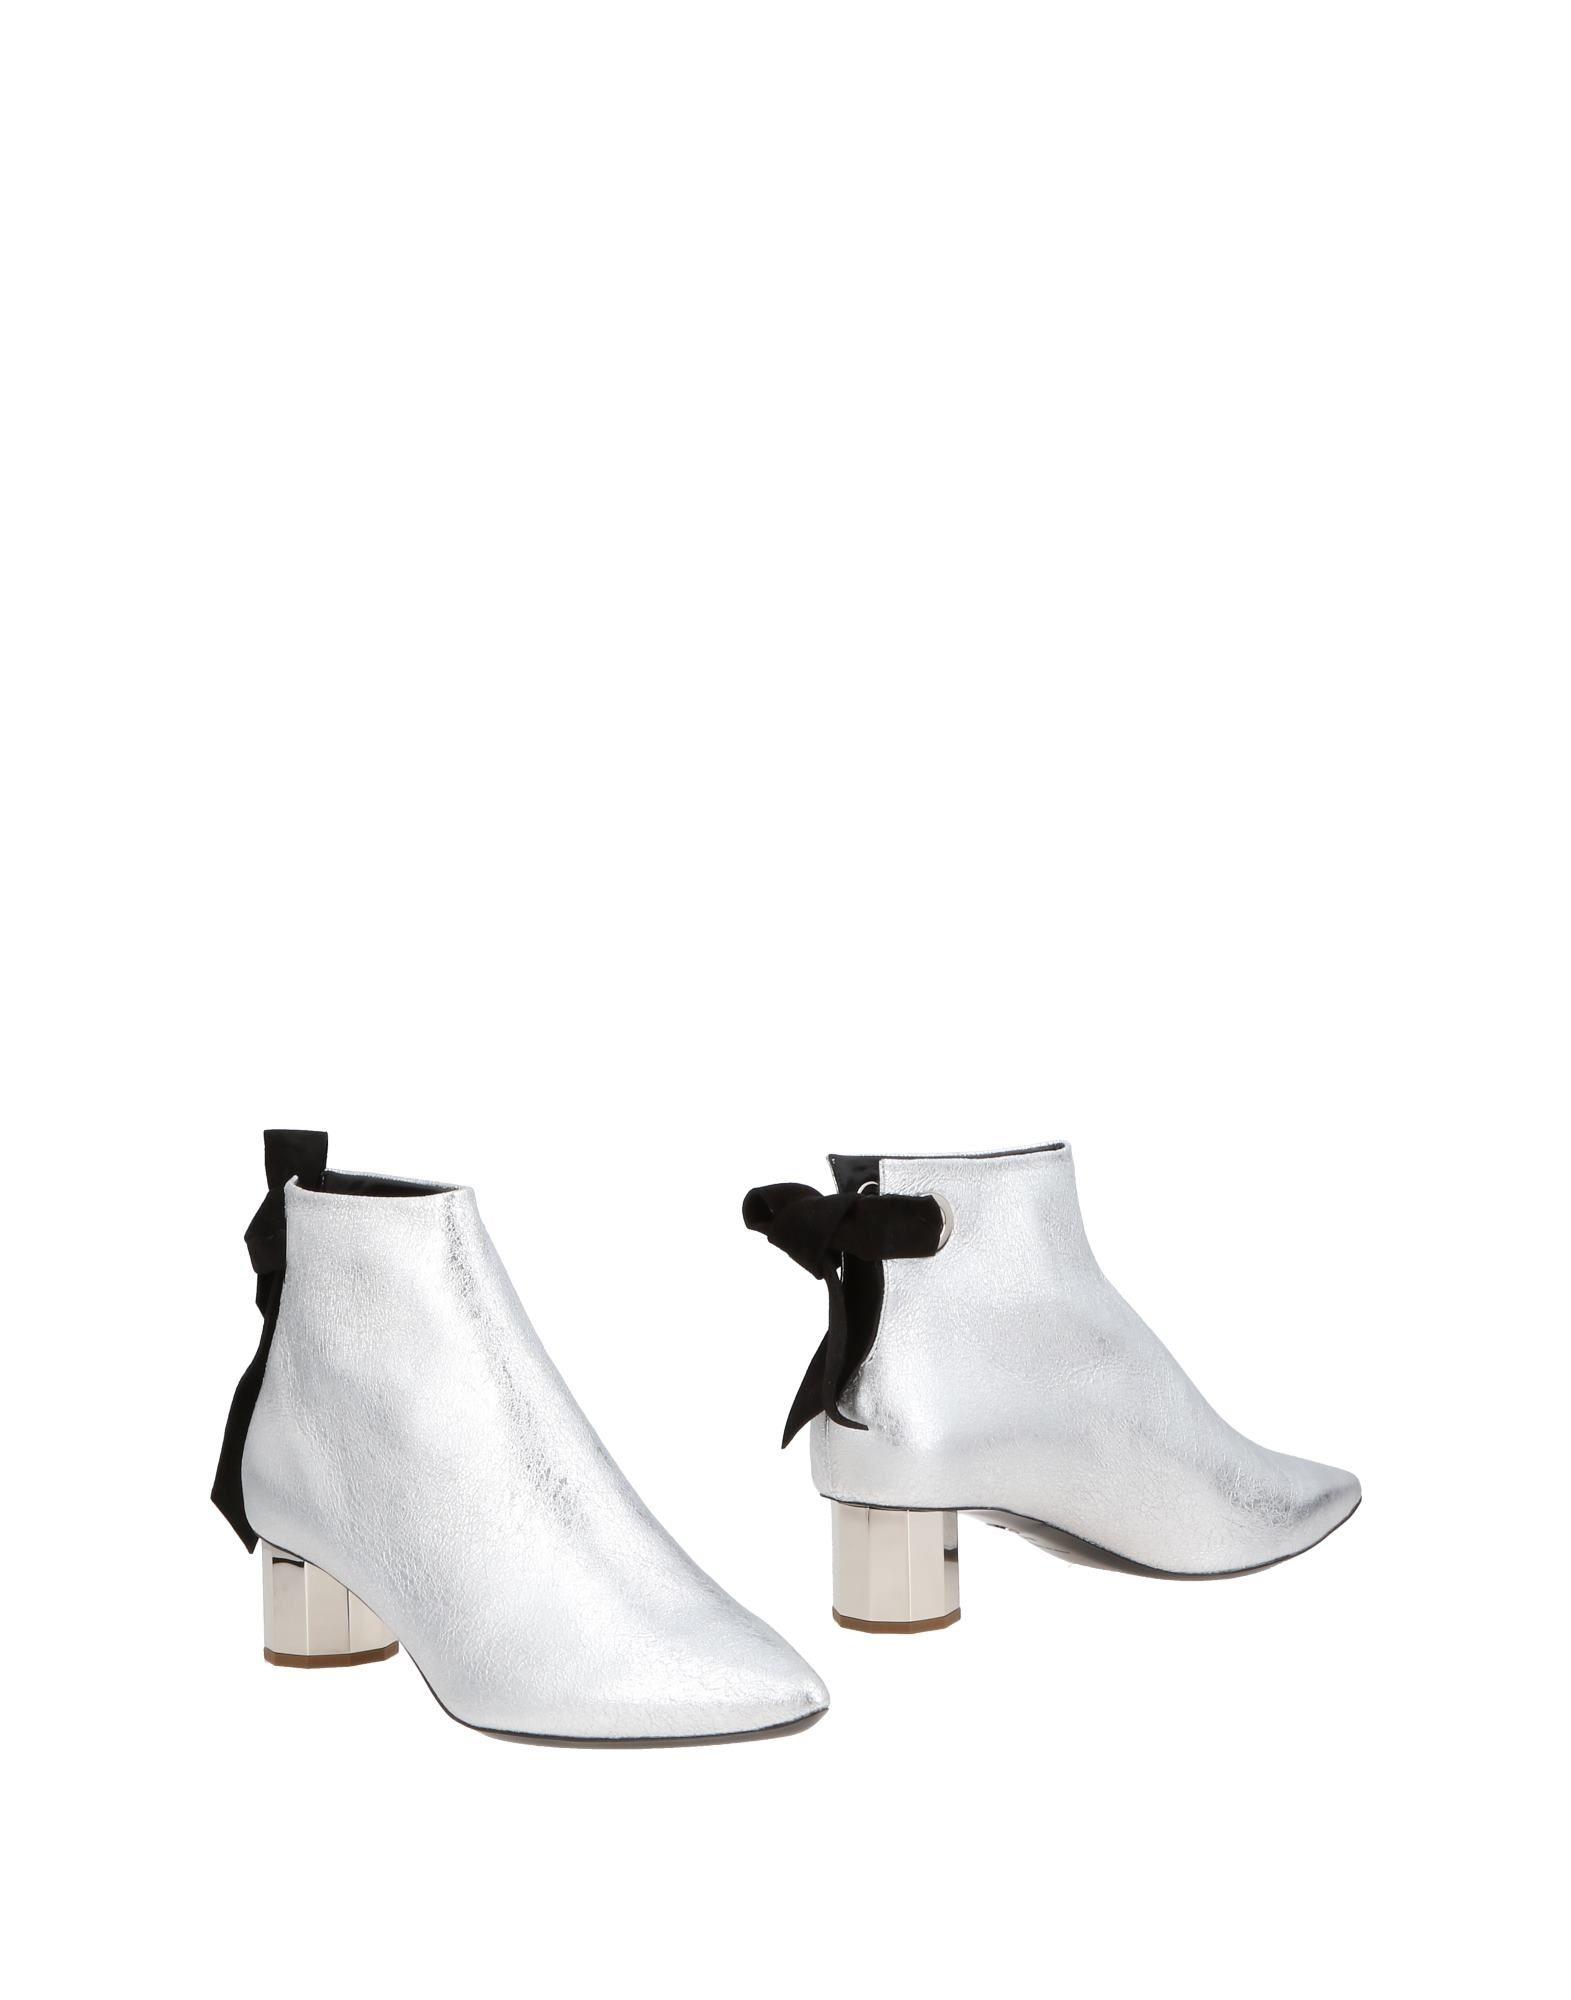 PROENZA SCHOULER Полусапоги и высокие ботинки цены онлайн